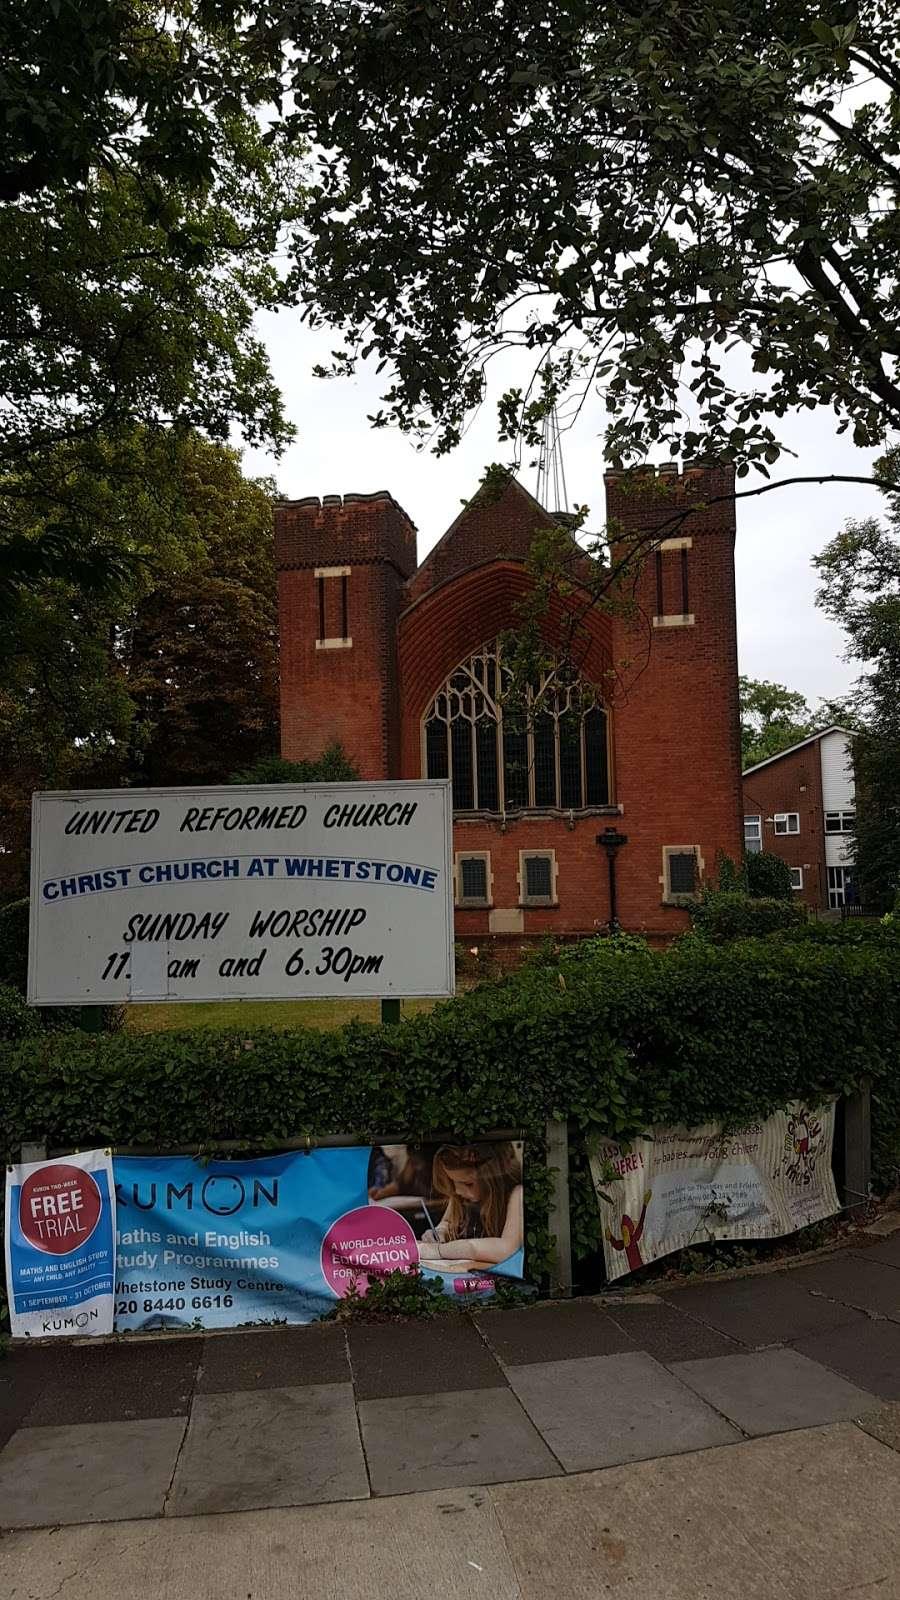 Christ Church - church  | Photo 6 of 9 | Address: Oakleigh Park N, Whetstone, London N20 9AR, UK | Phone: 020 3234 4059